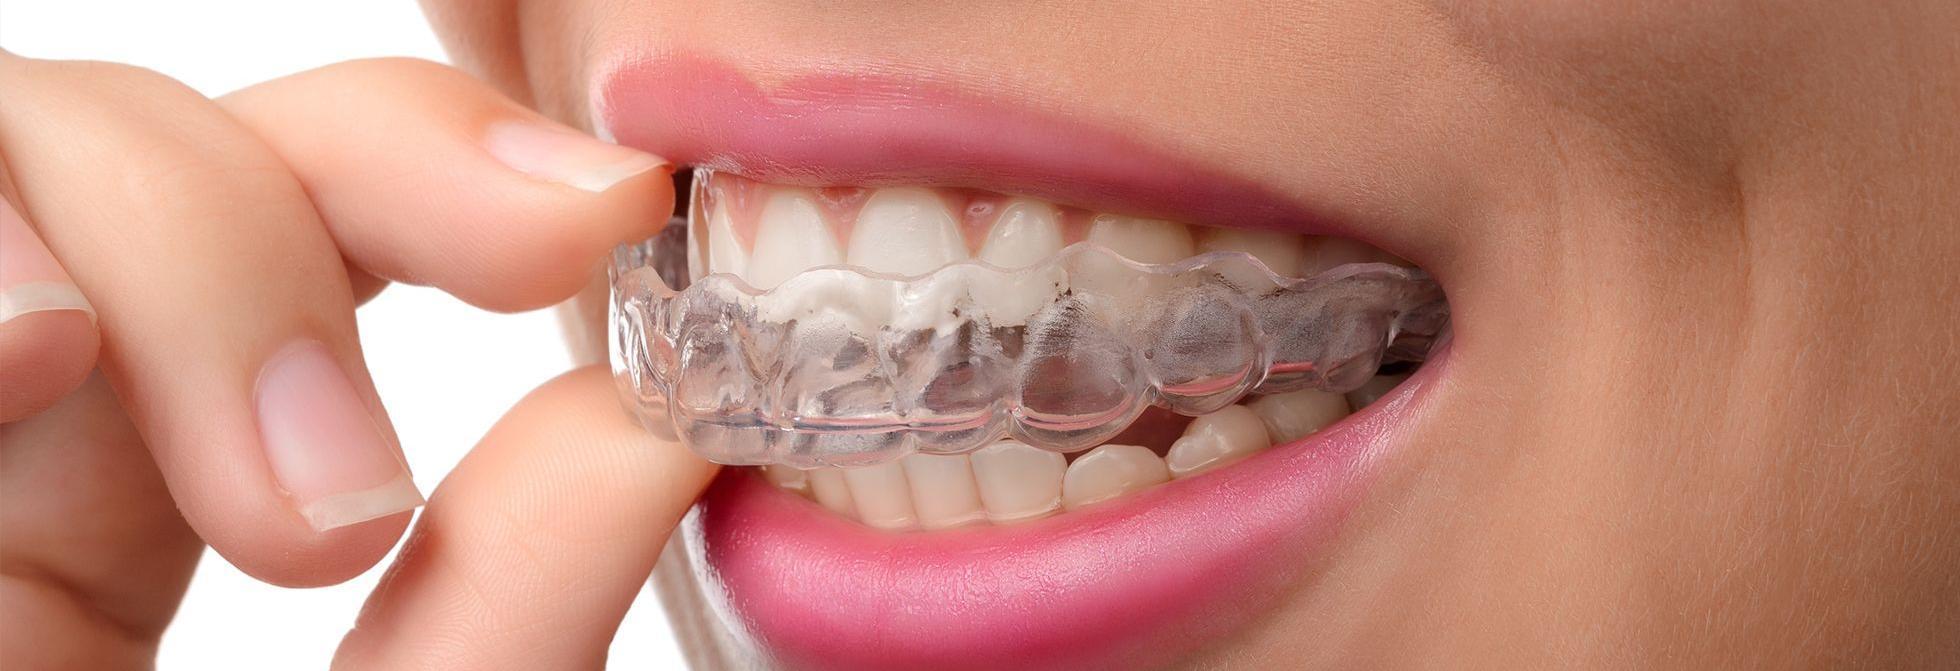 Liu Orthodontics in Federal Way, WA banner image